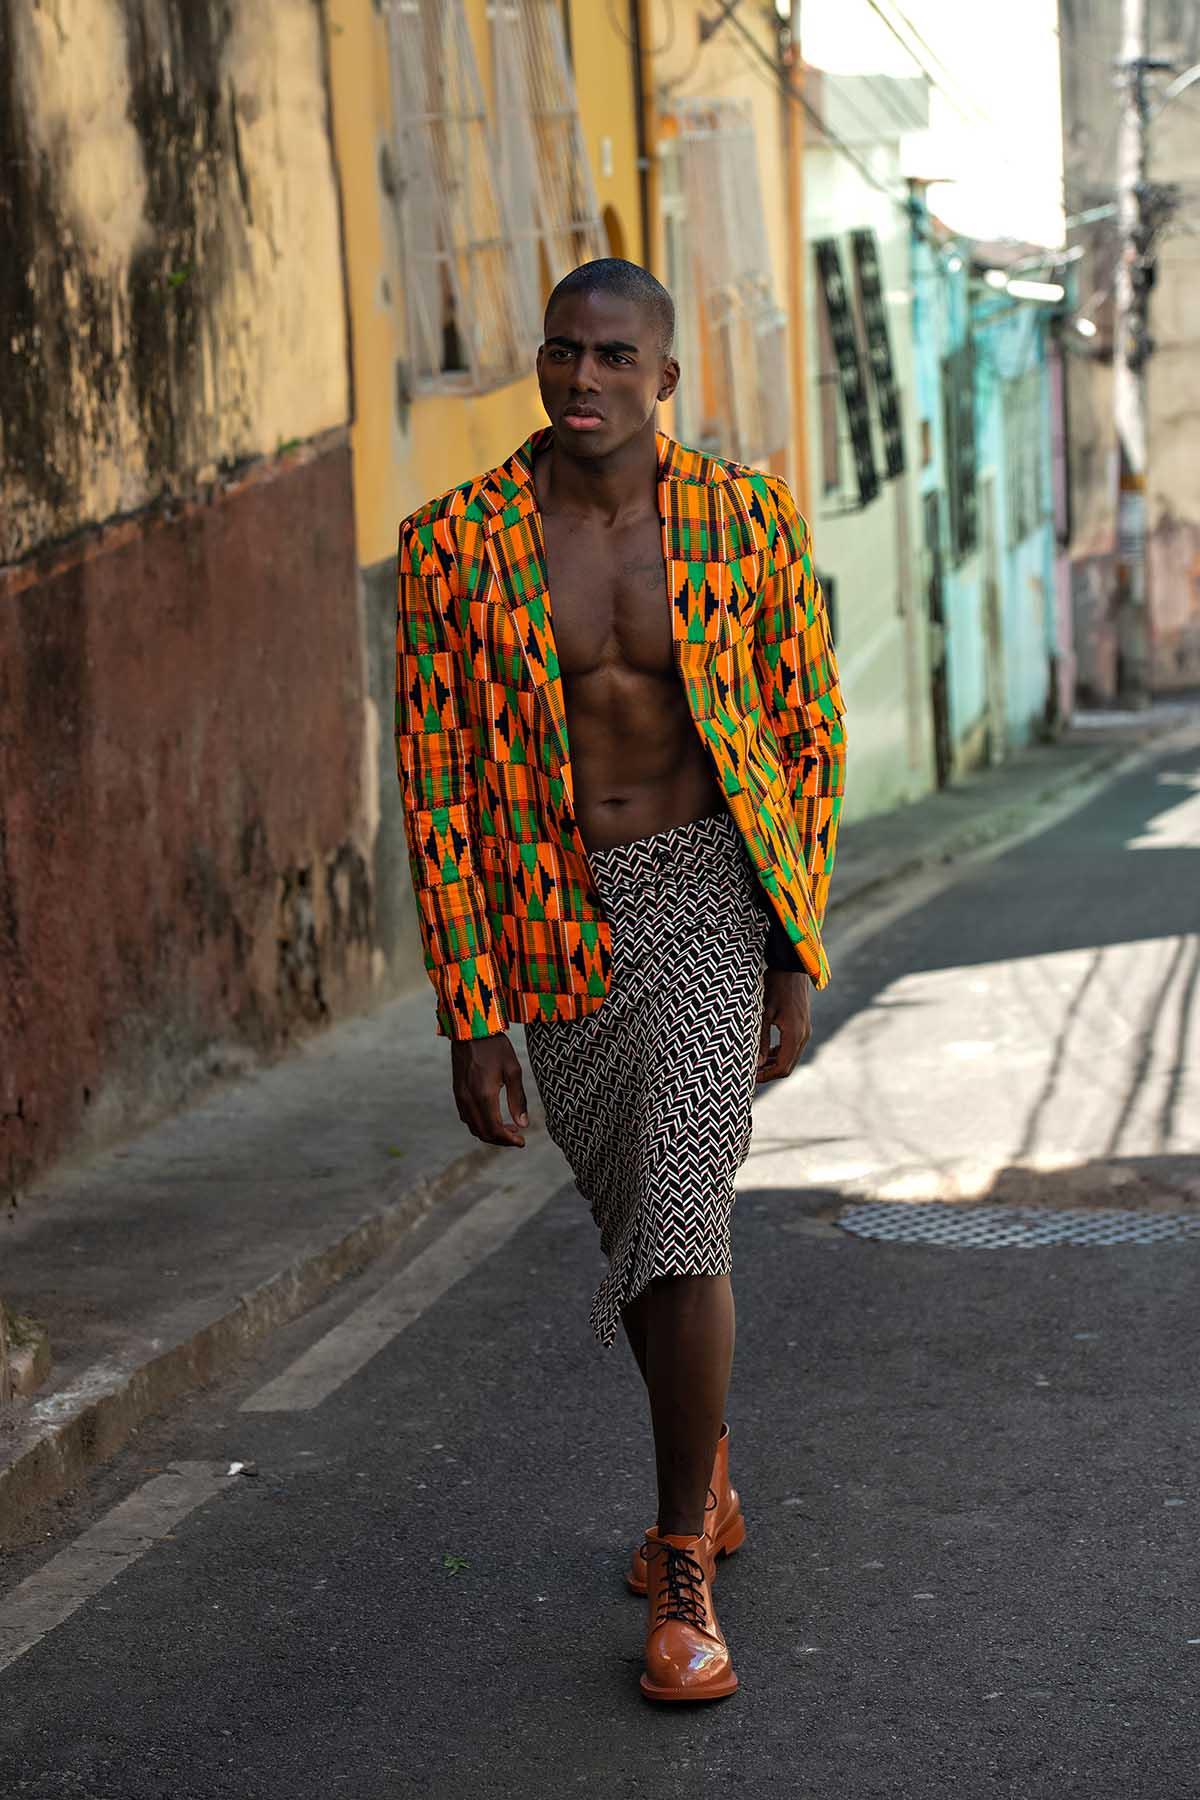 Carlos Cruz by Viny Soares for Brazilian Male Model